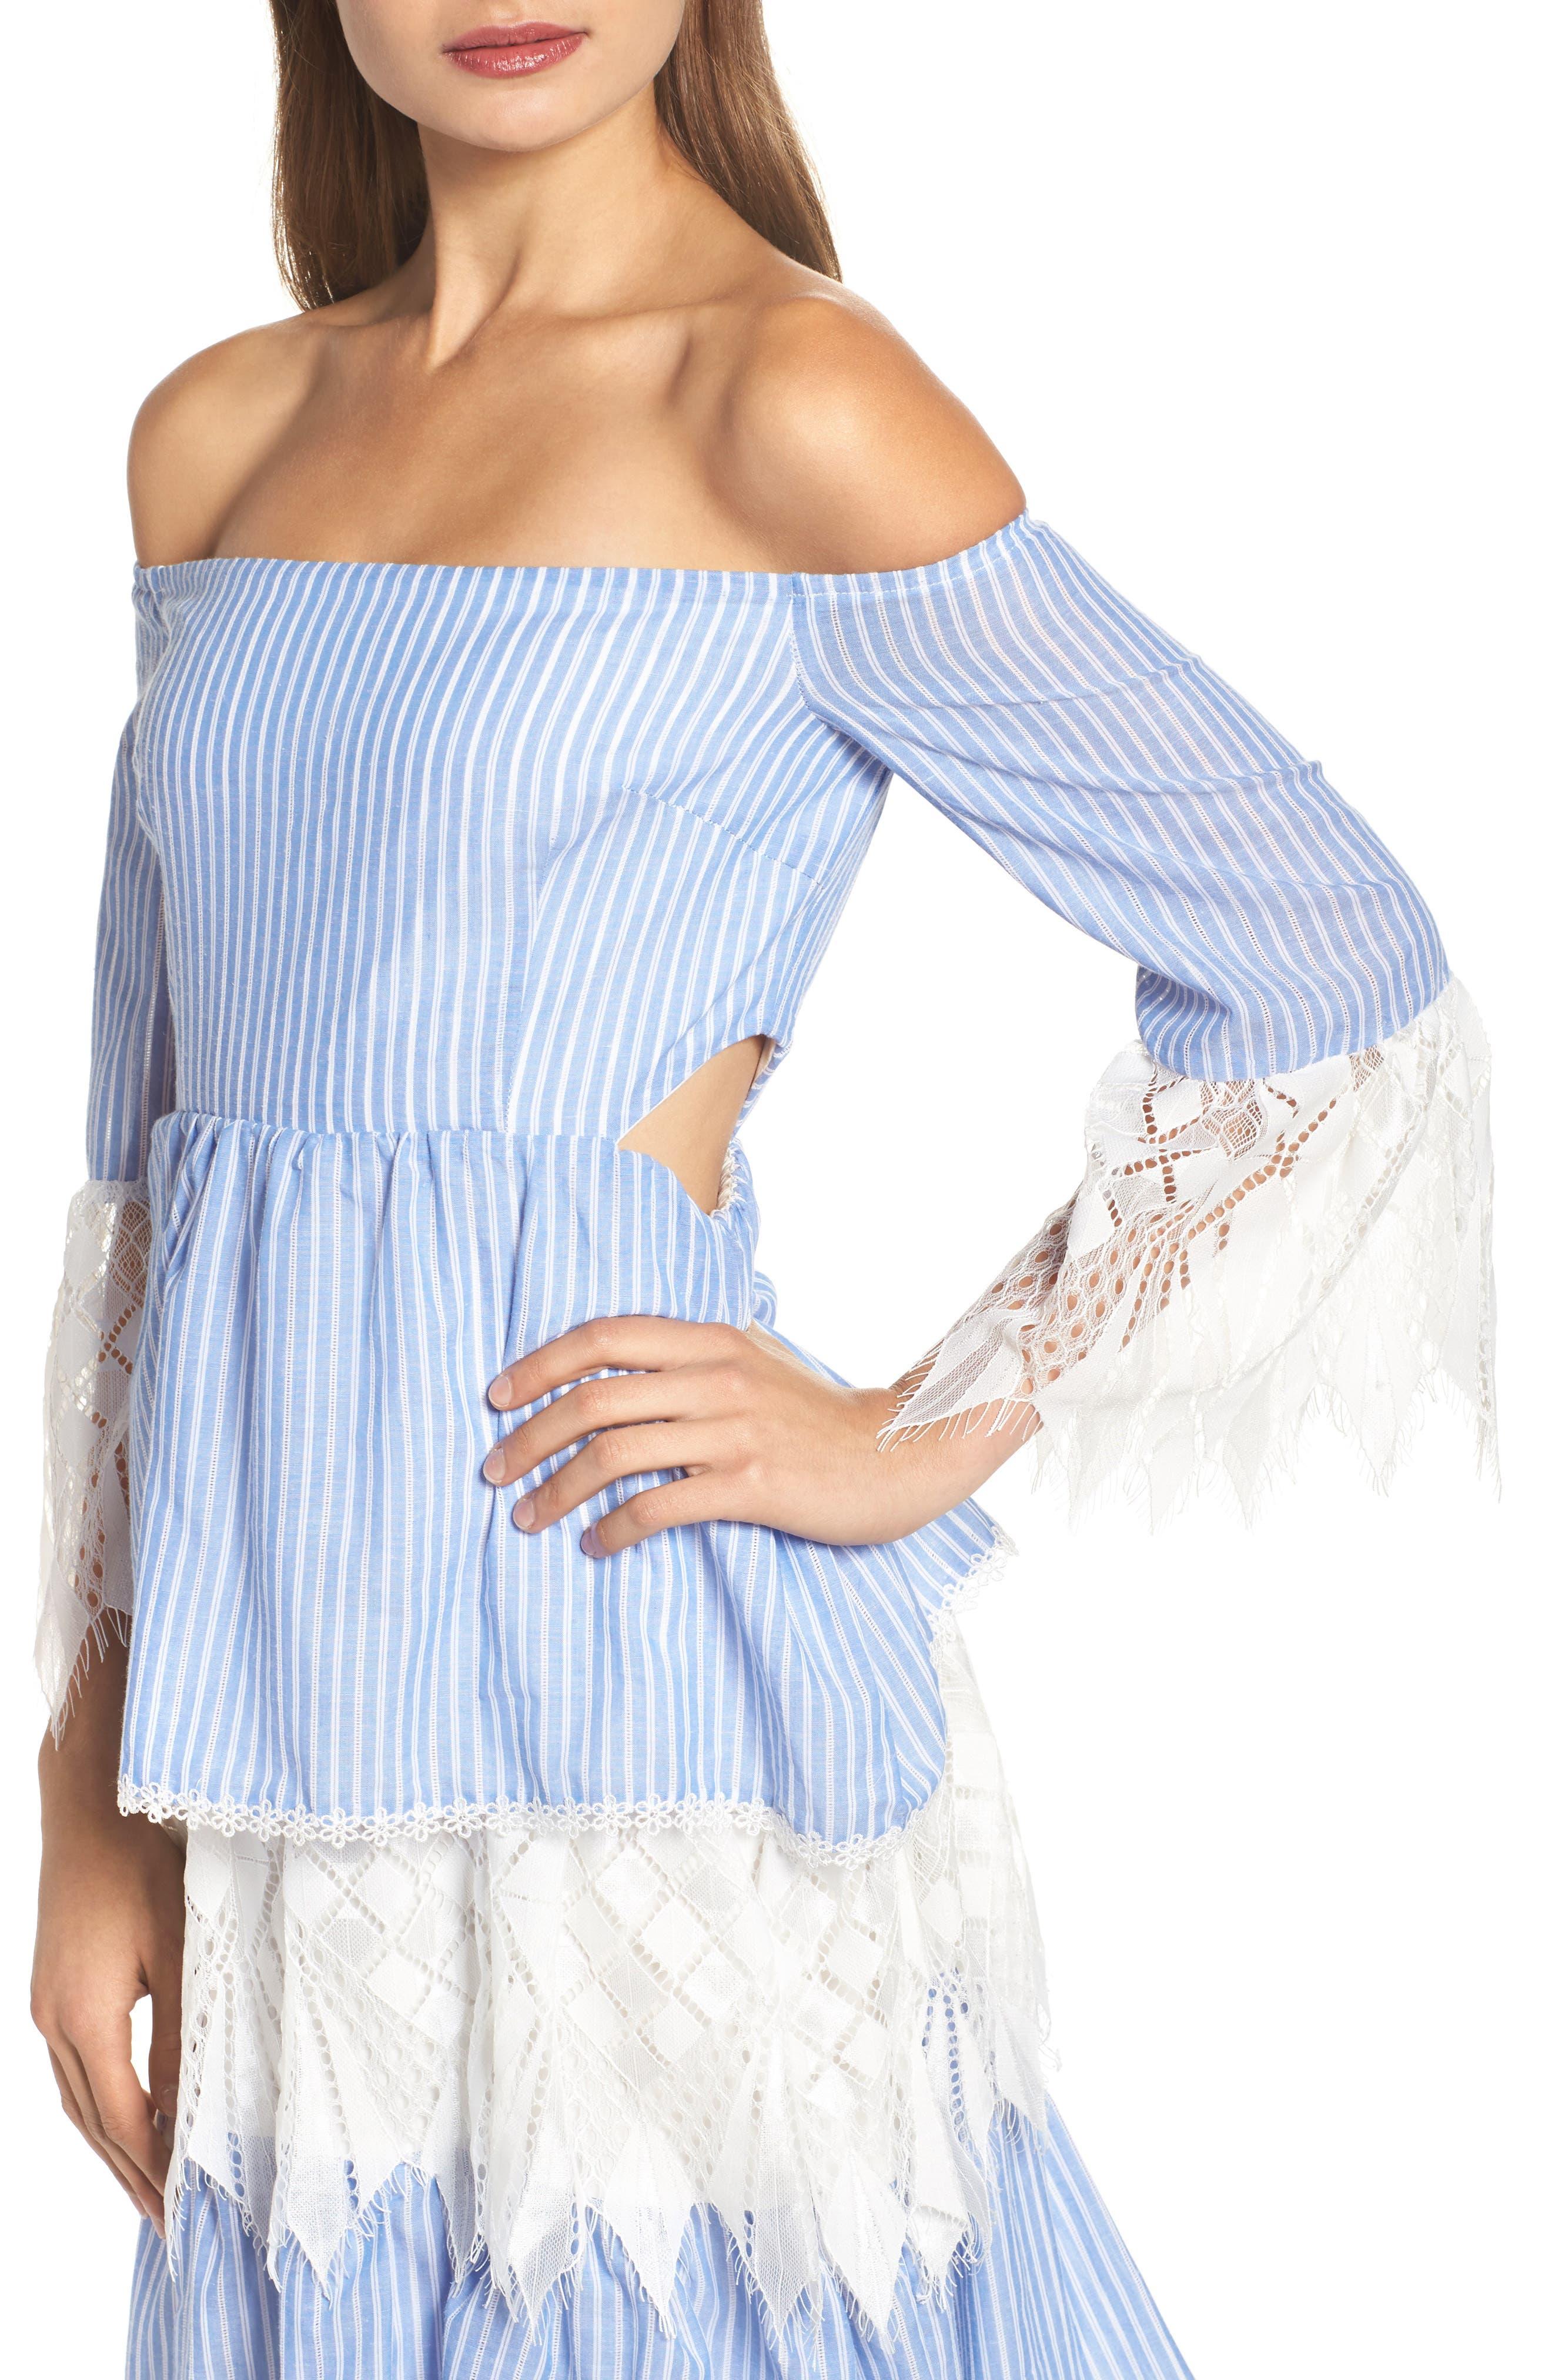 Addison Lace Tier Off the Shoulder Midi Dress,                             Alternate thumbnail 4, color,                             434